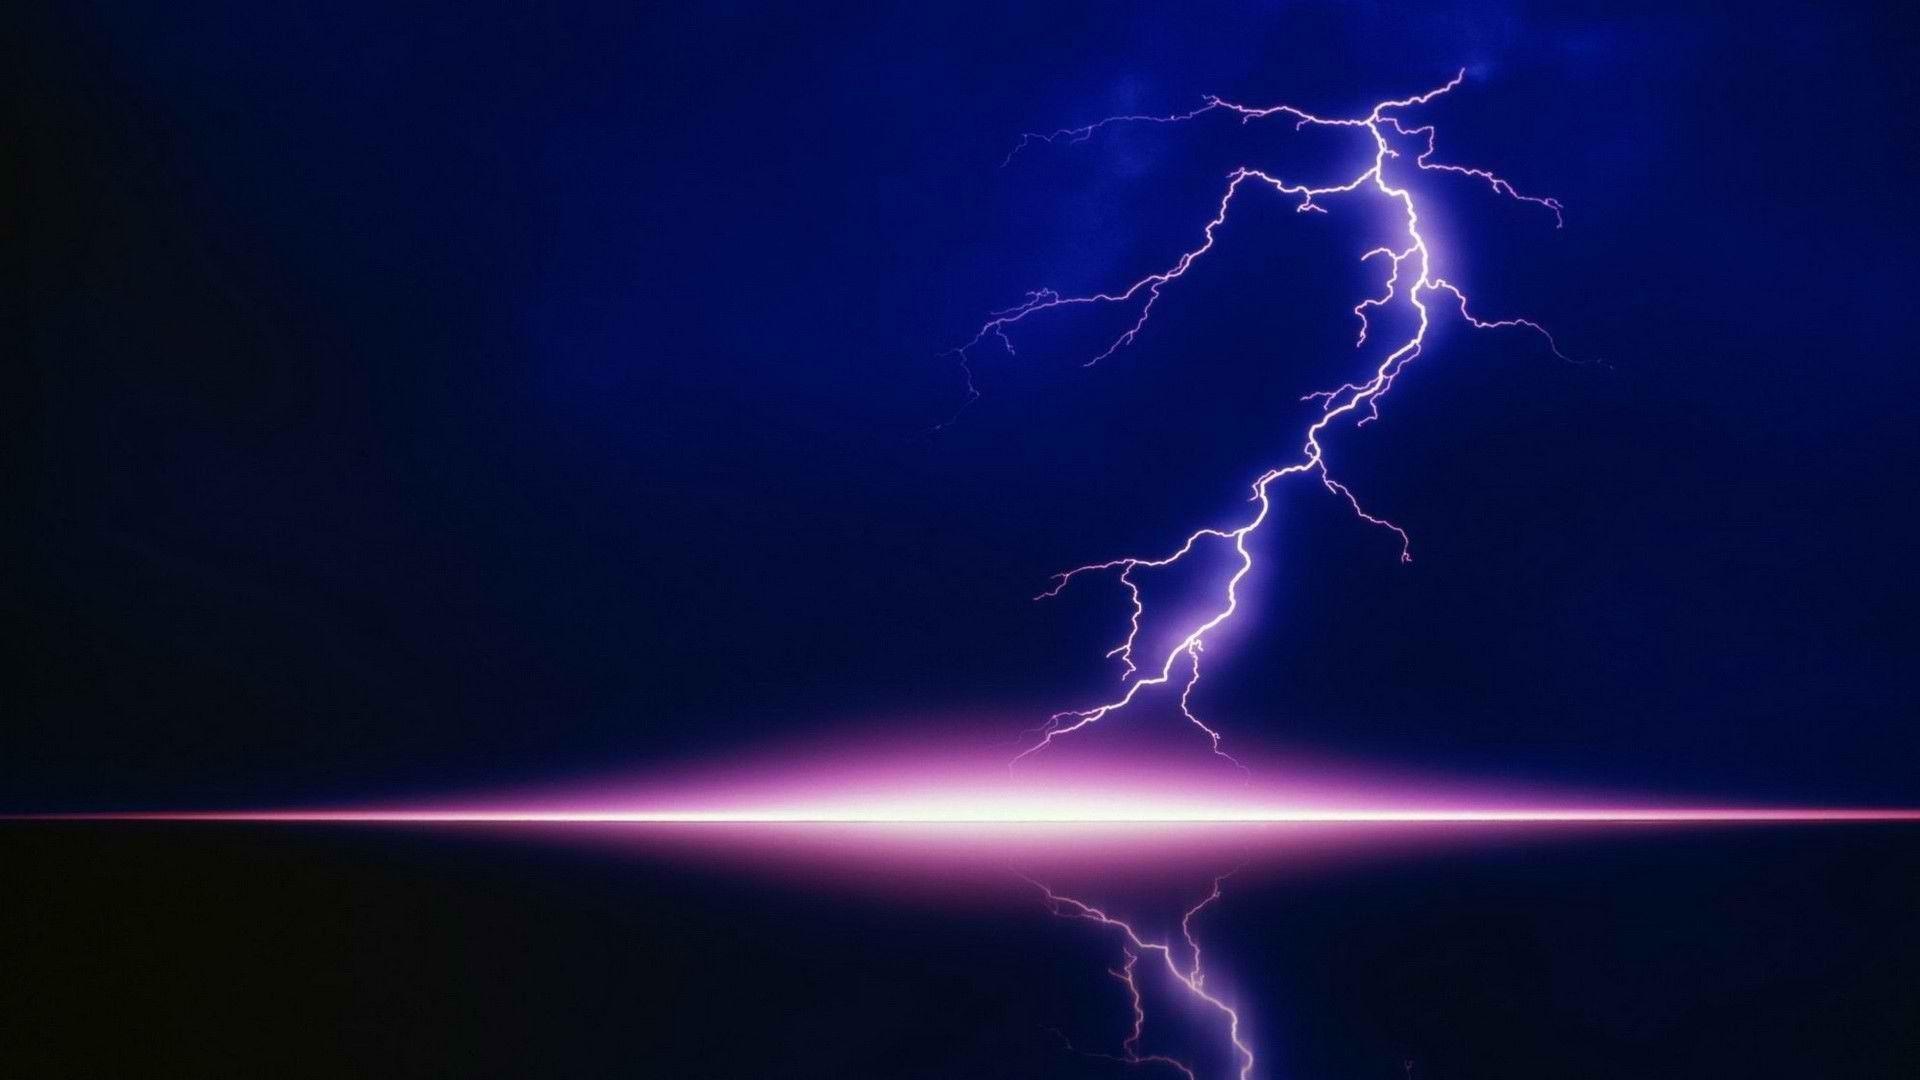 HD Wallpapers – Download Purple Lightning Wallpaper   100% High .